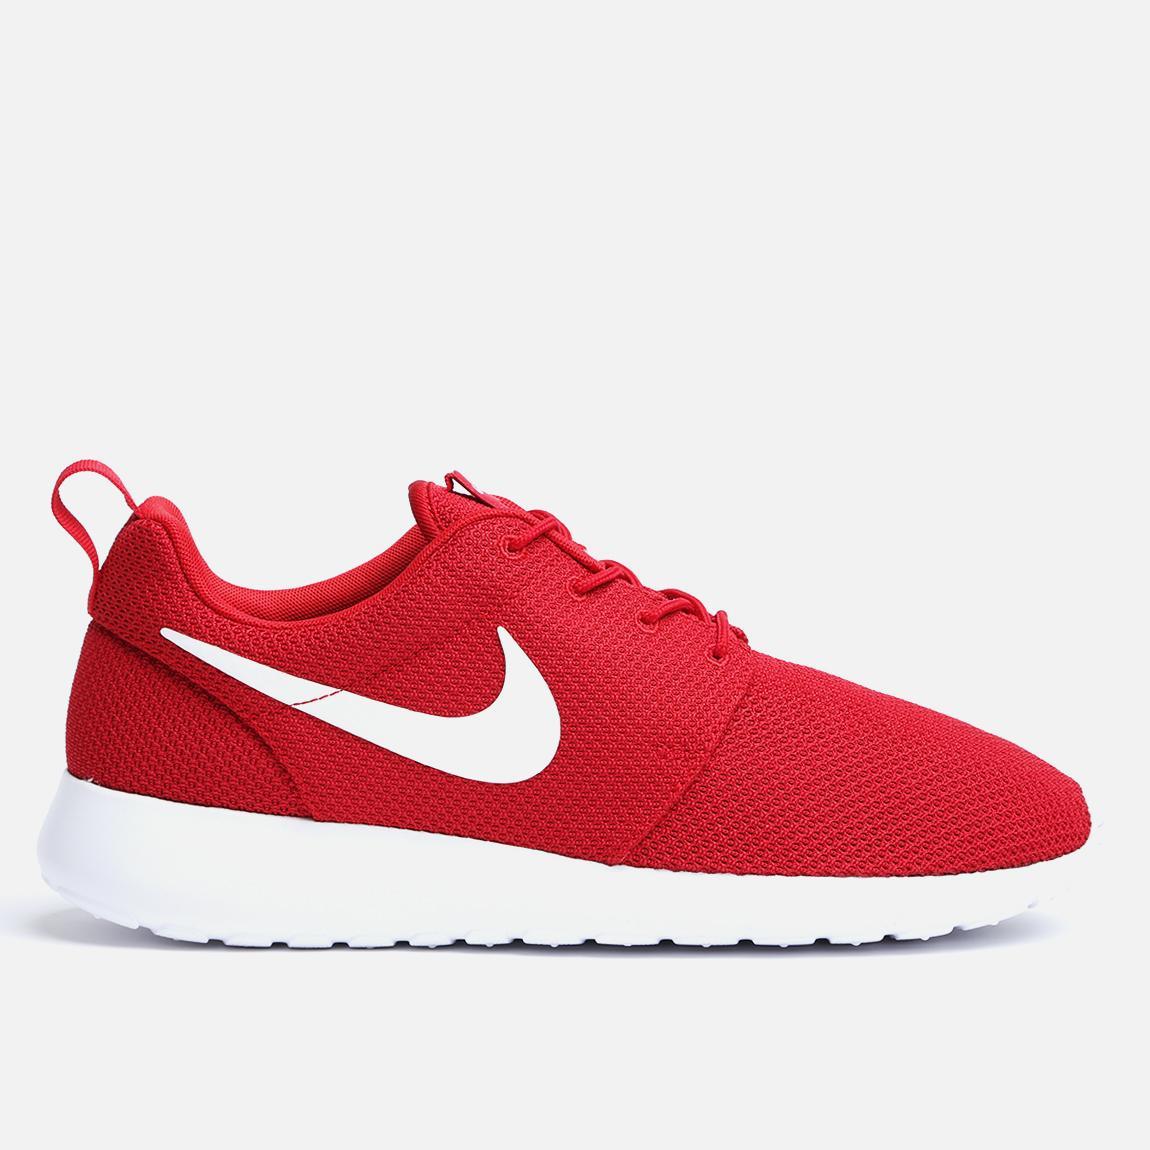 62855029b2fb Roshe Run - 511881-612 - Gym Red   White Nike Sneakers